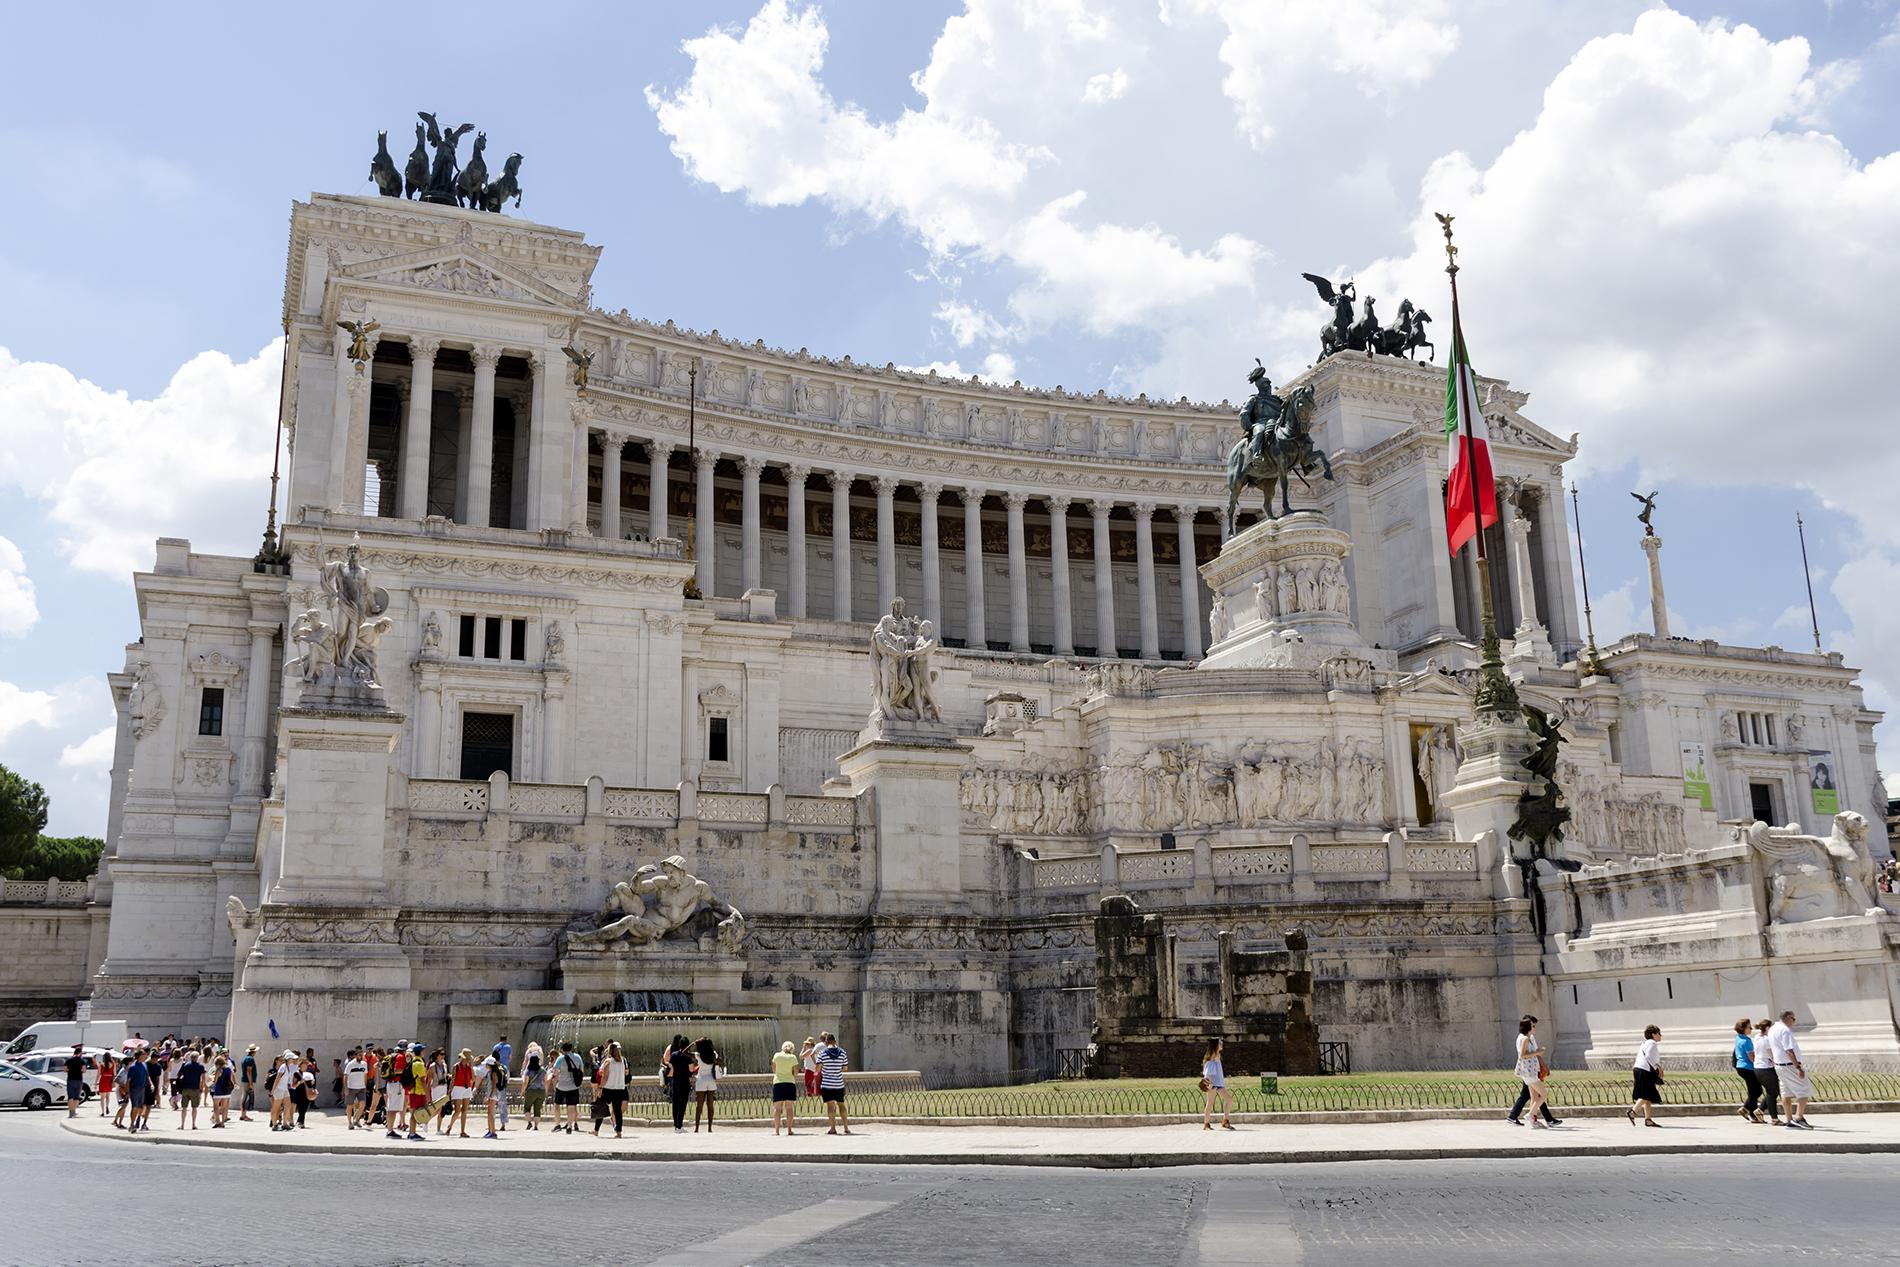 Řím - Monumento Nazionale a Vittorio Emanuele II